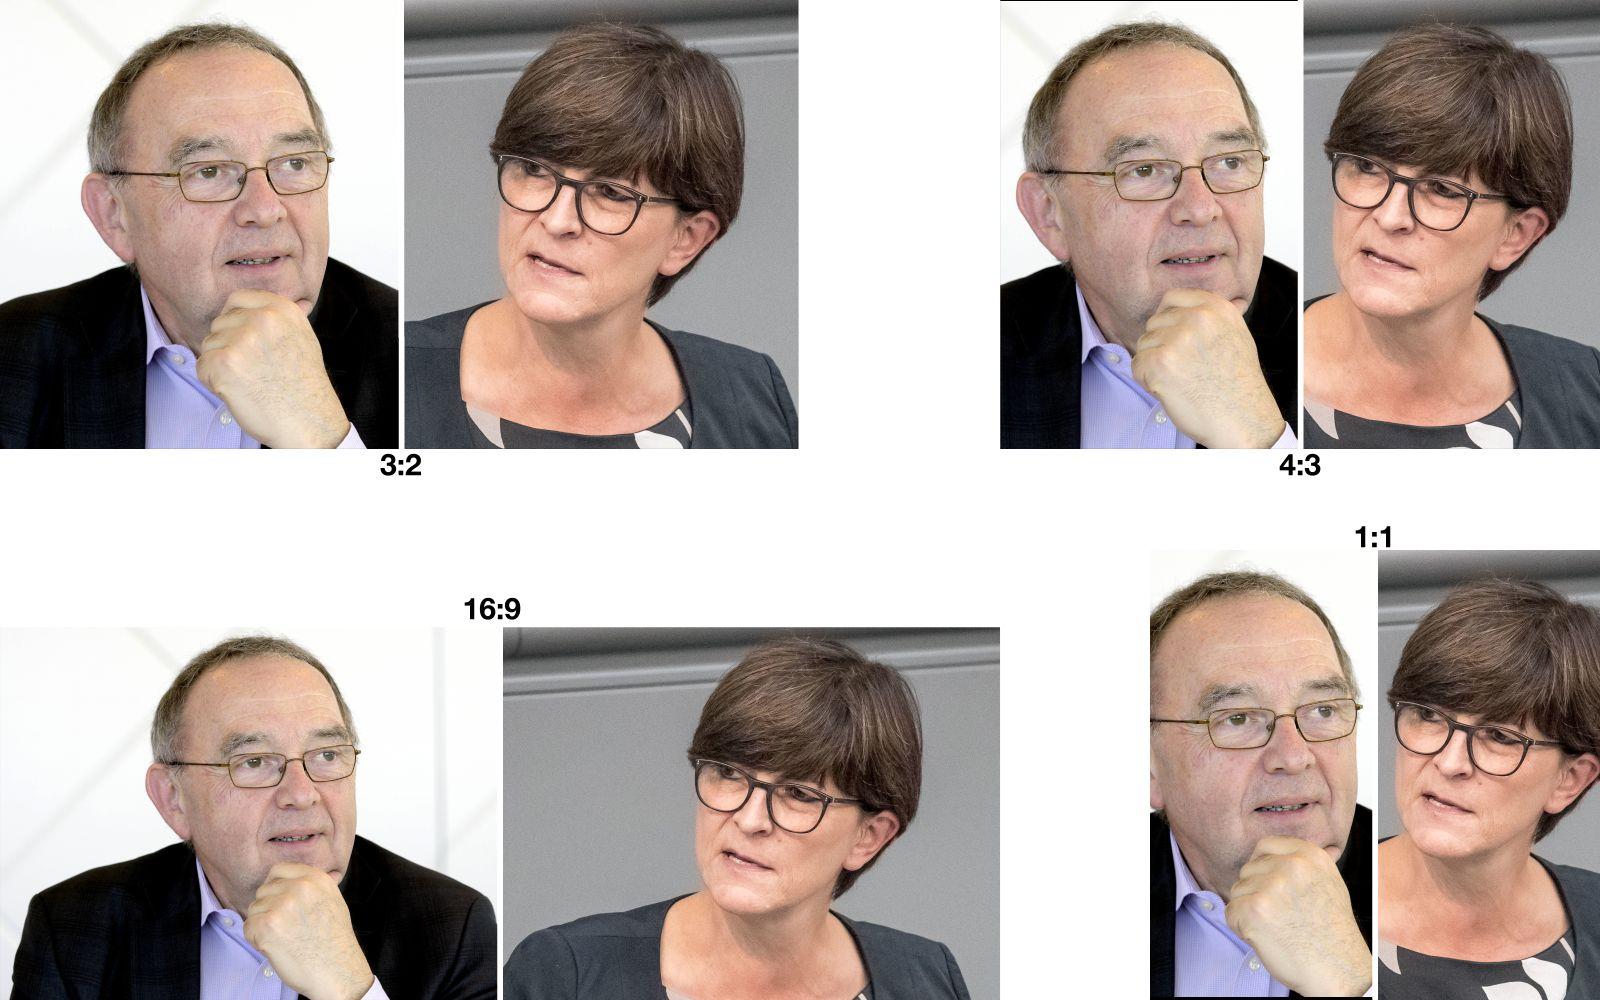 EINMALIGE VERWENDUNG Kombo Saskia Esken Norbert Walter-Borjans